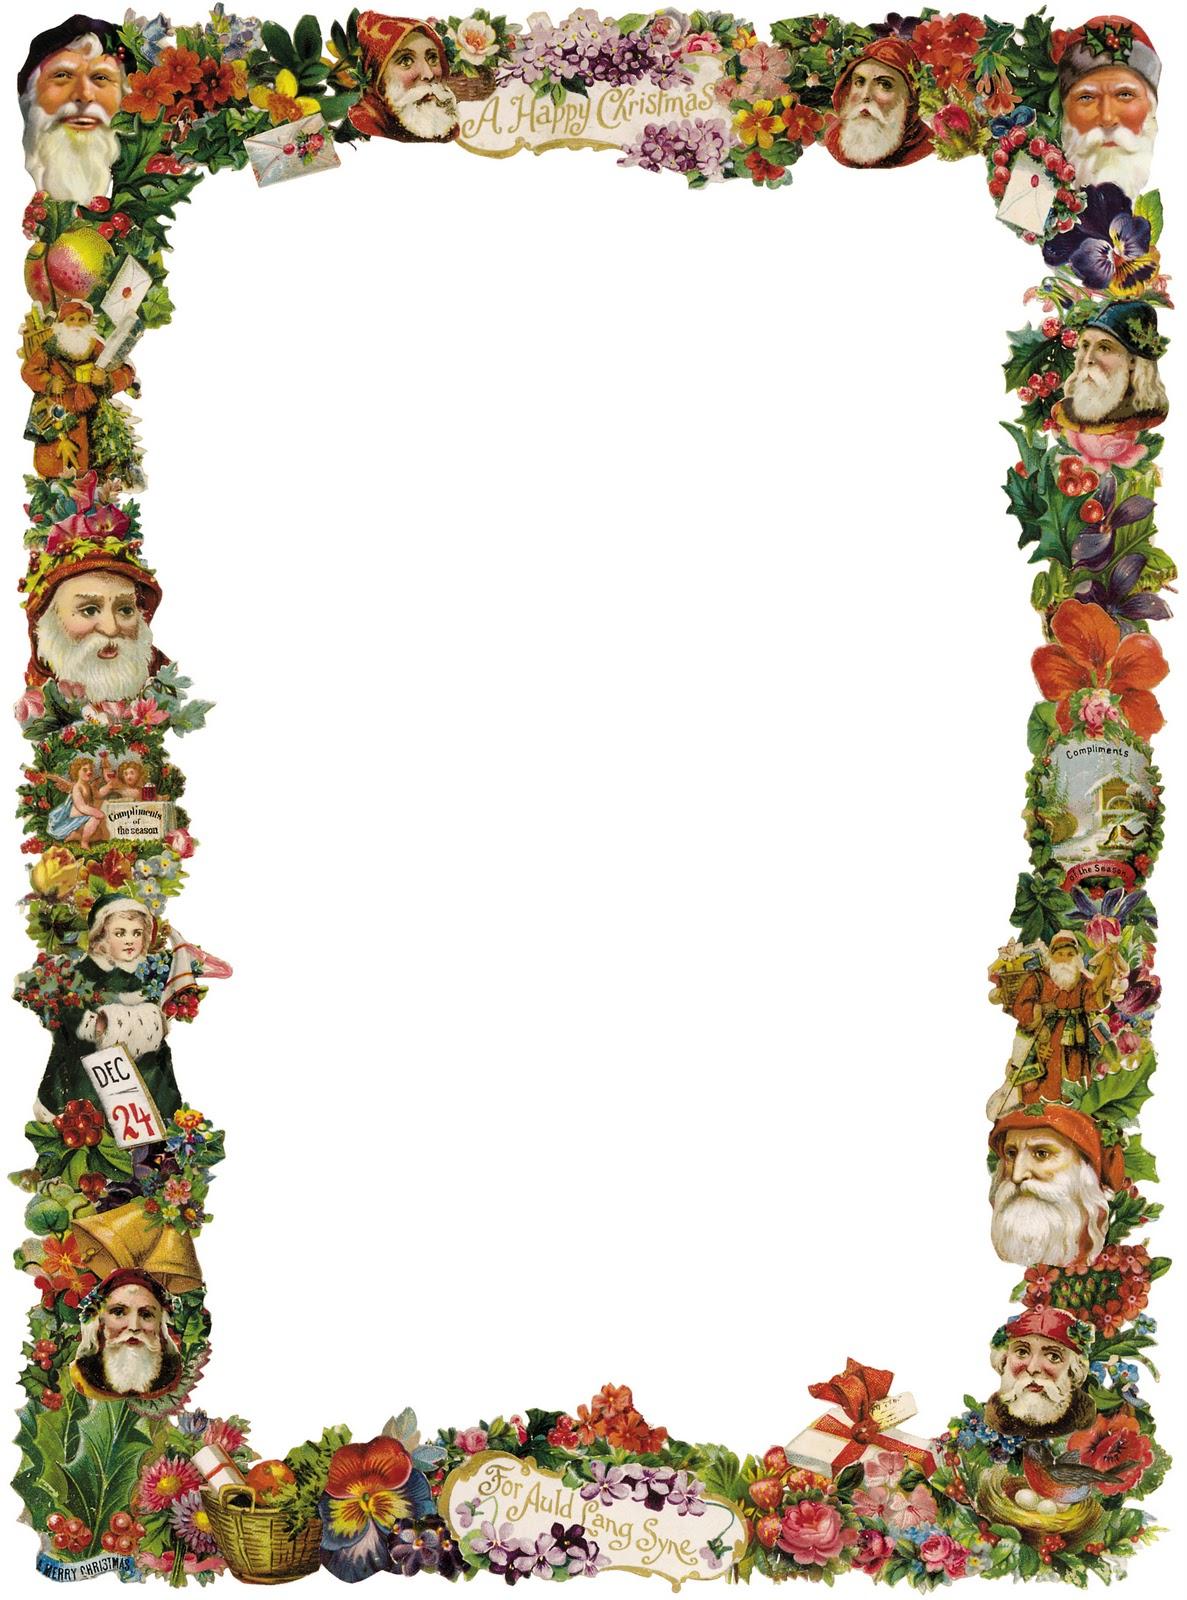 free vintage christmas border clip art - photo #13